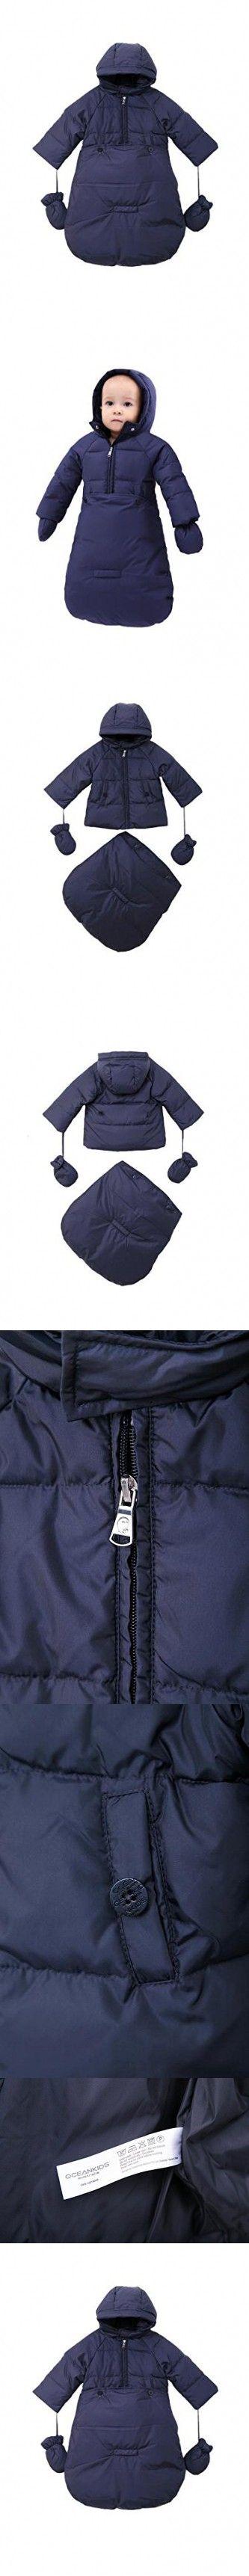 9c6c0a7b9 Oceankids Baby Boys Navy Blue Newborn Pram Down Bunting Snowsuit ...